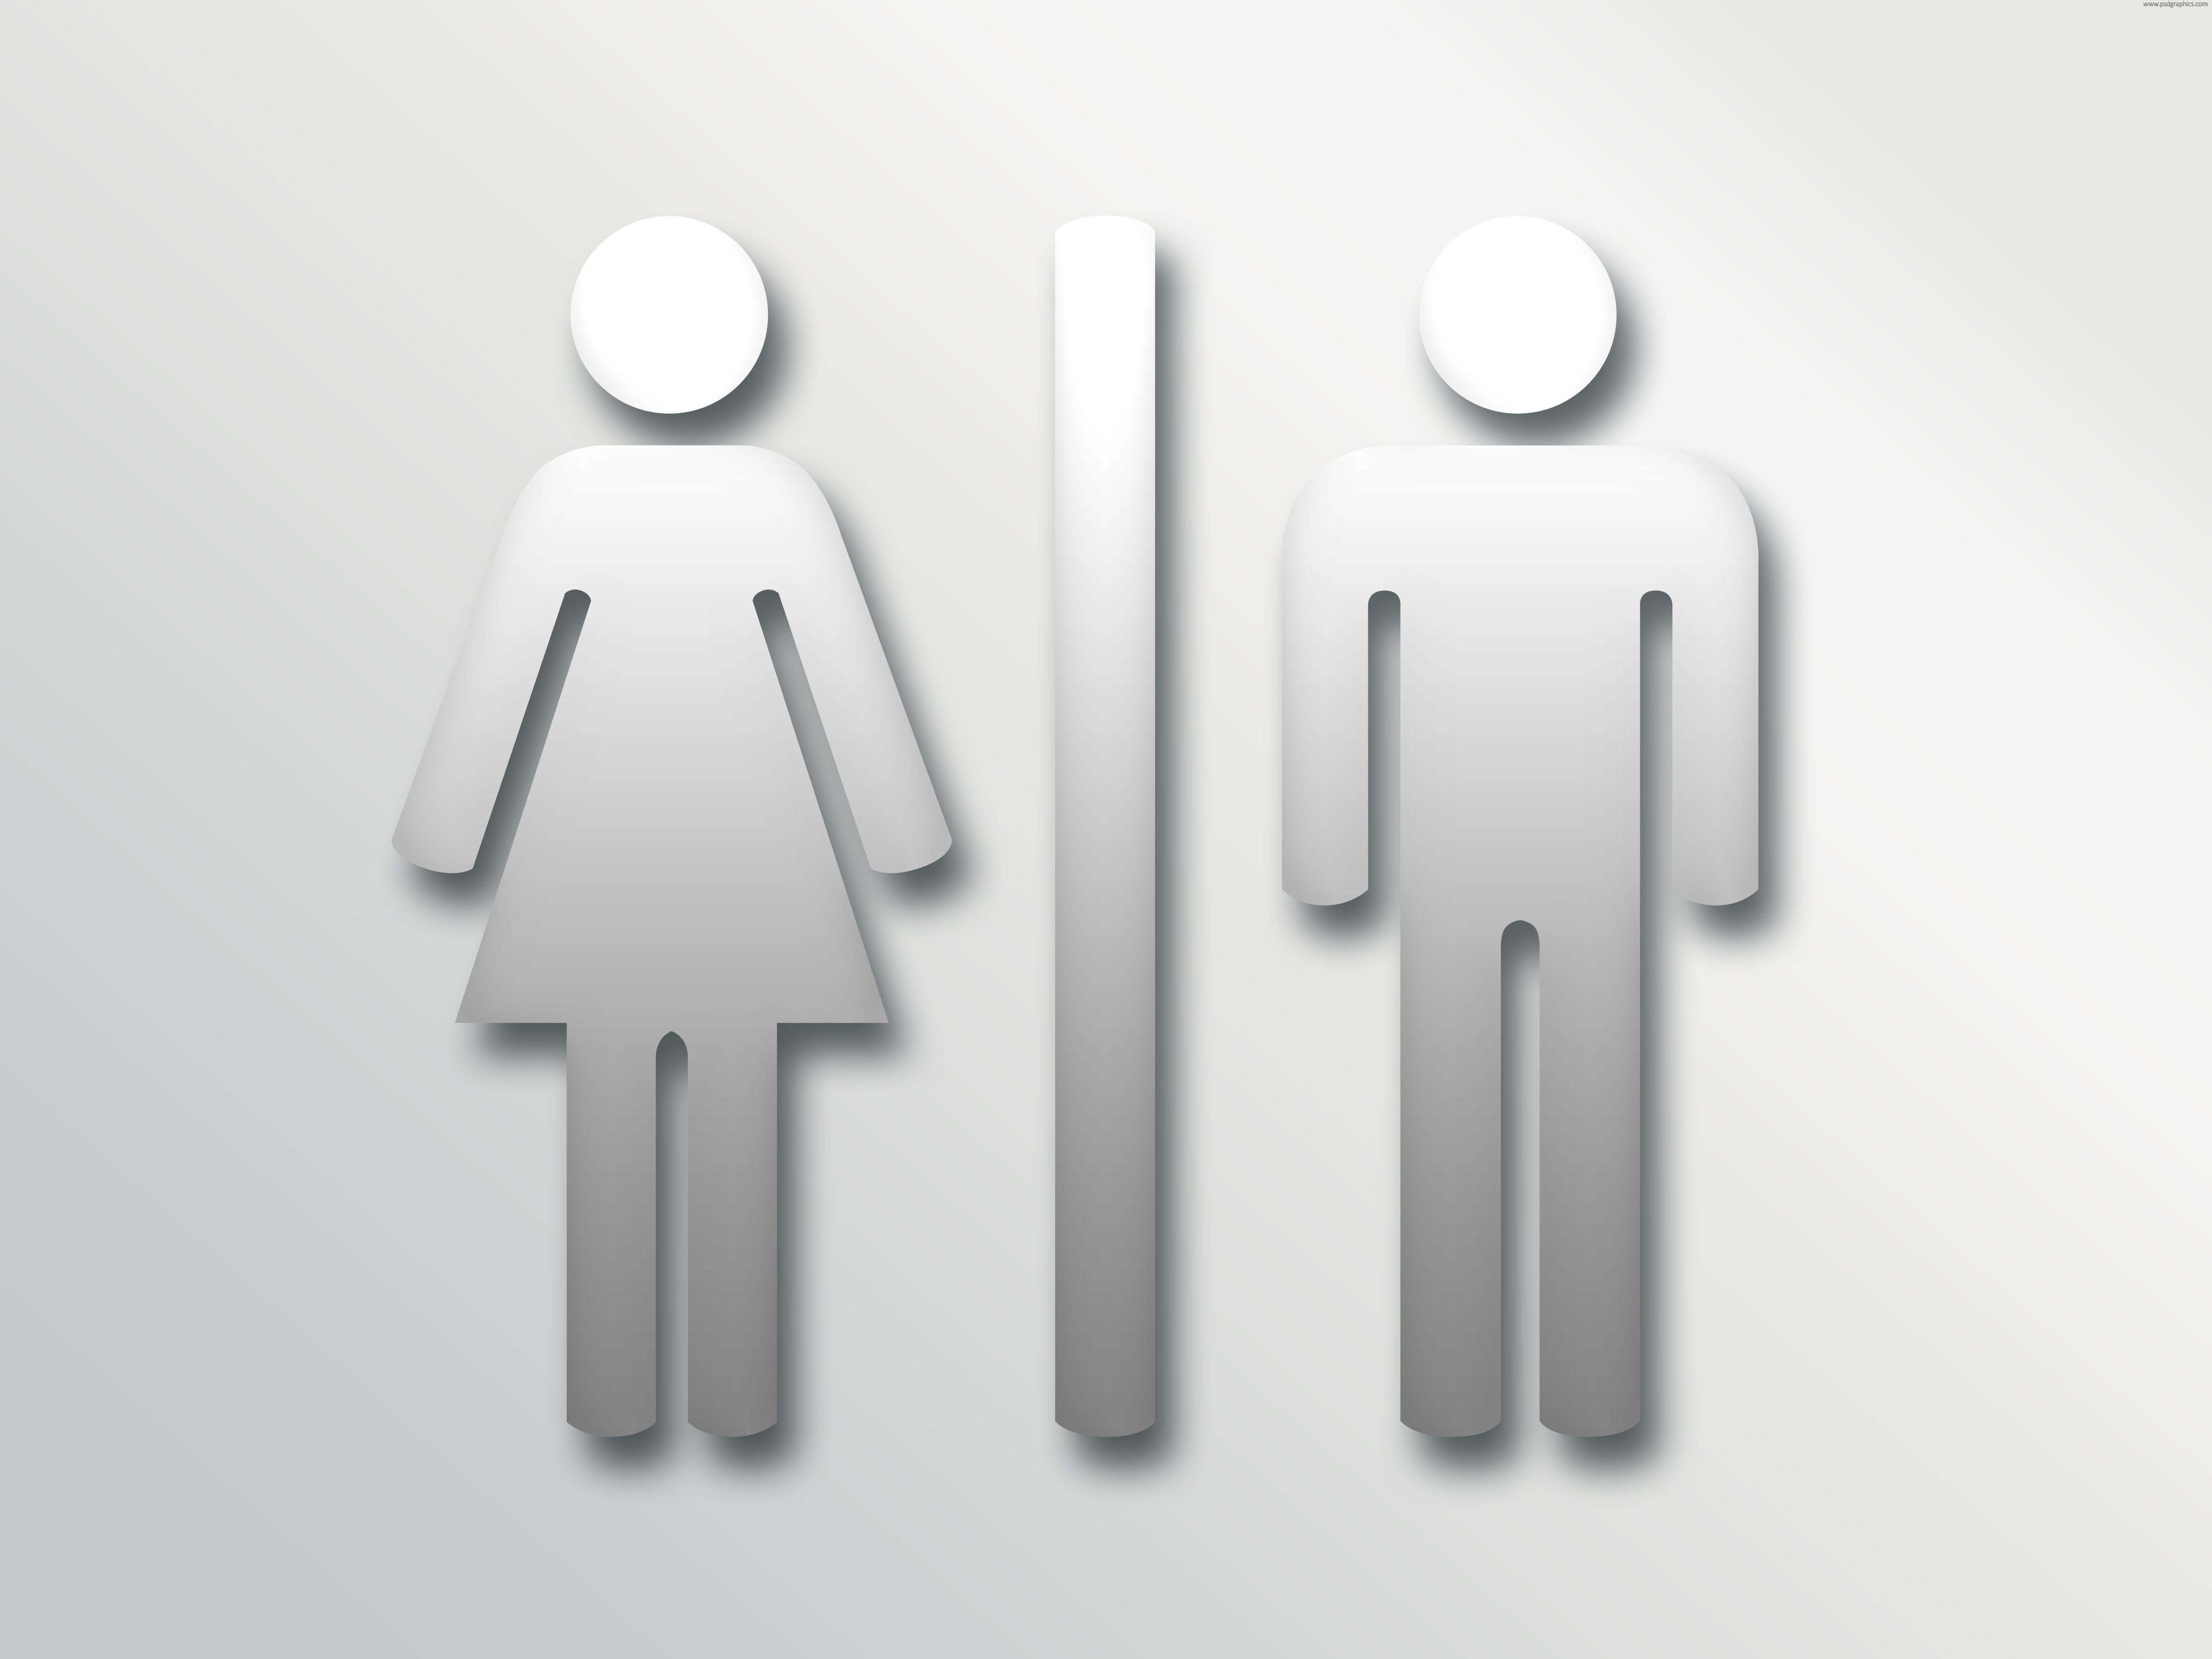 Male bathroom sign - Commercial Bathroom Design Gray Red Restroom Toilet Sign